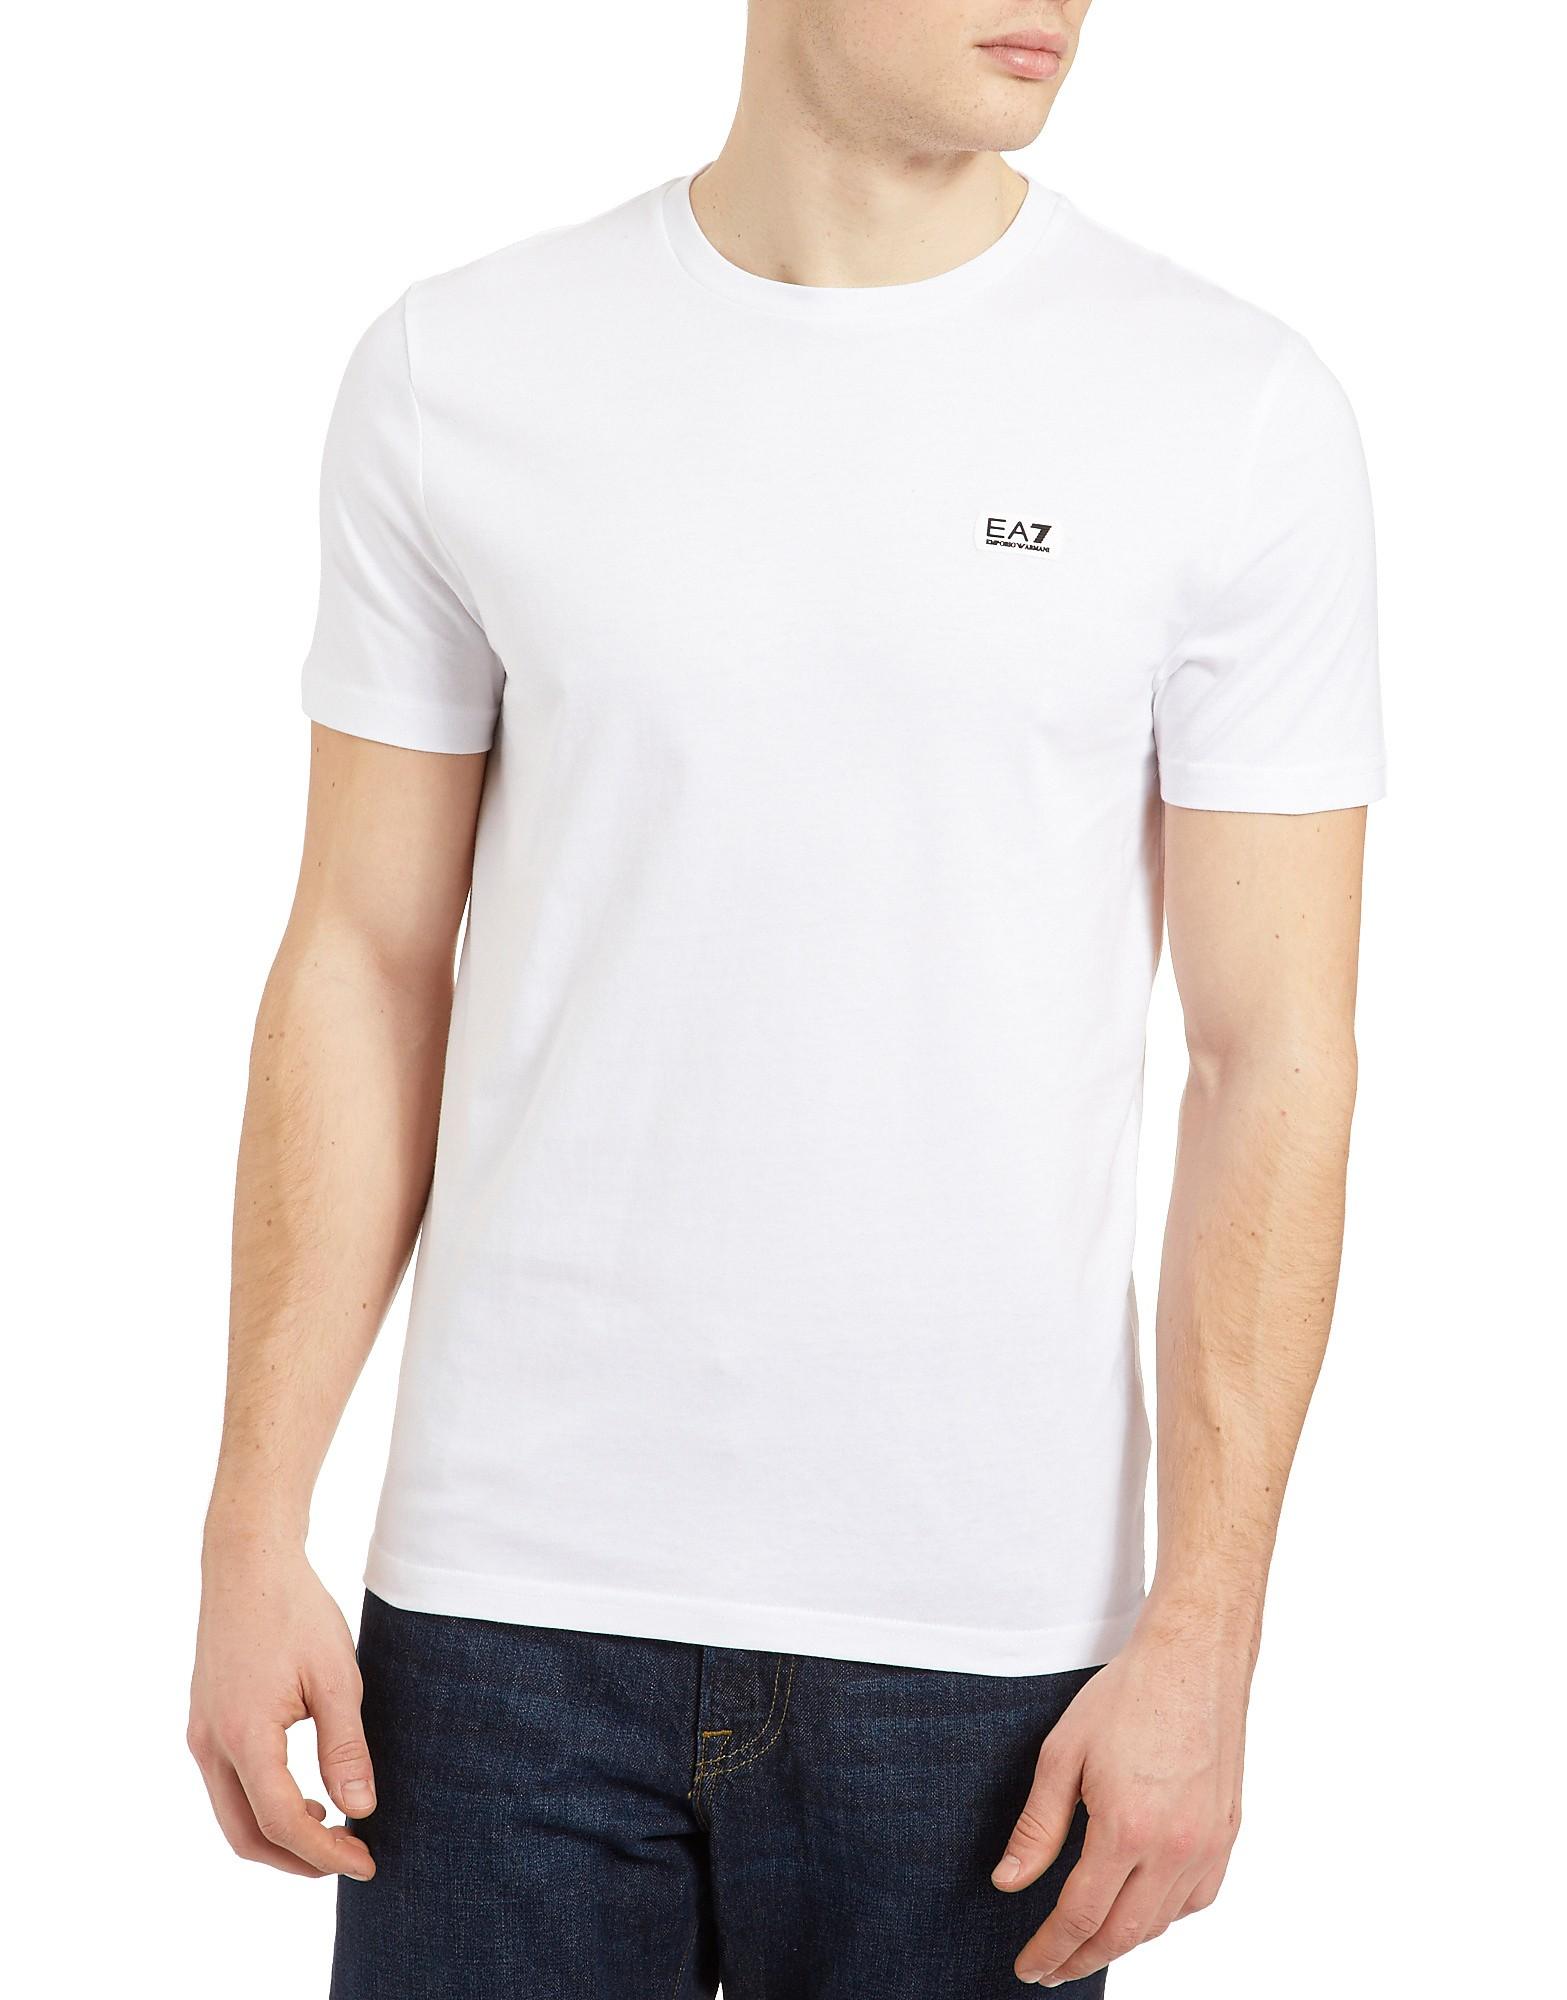 Emporio Armani EA7 Core Logo T-Shirt product image